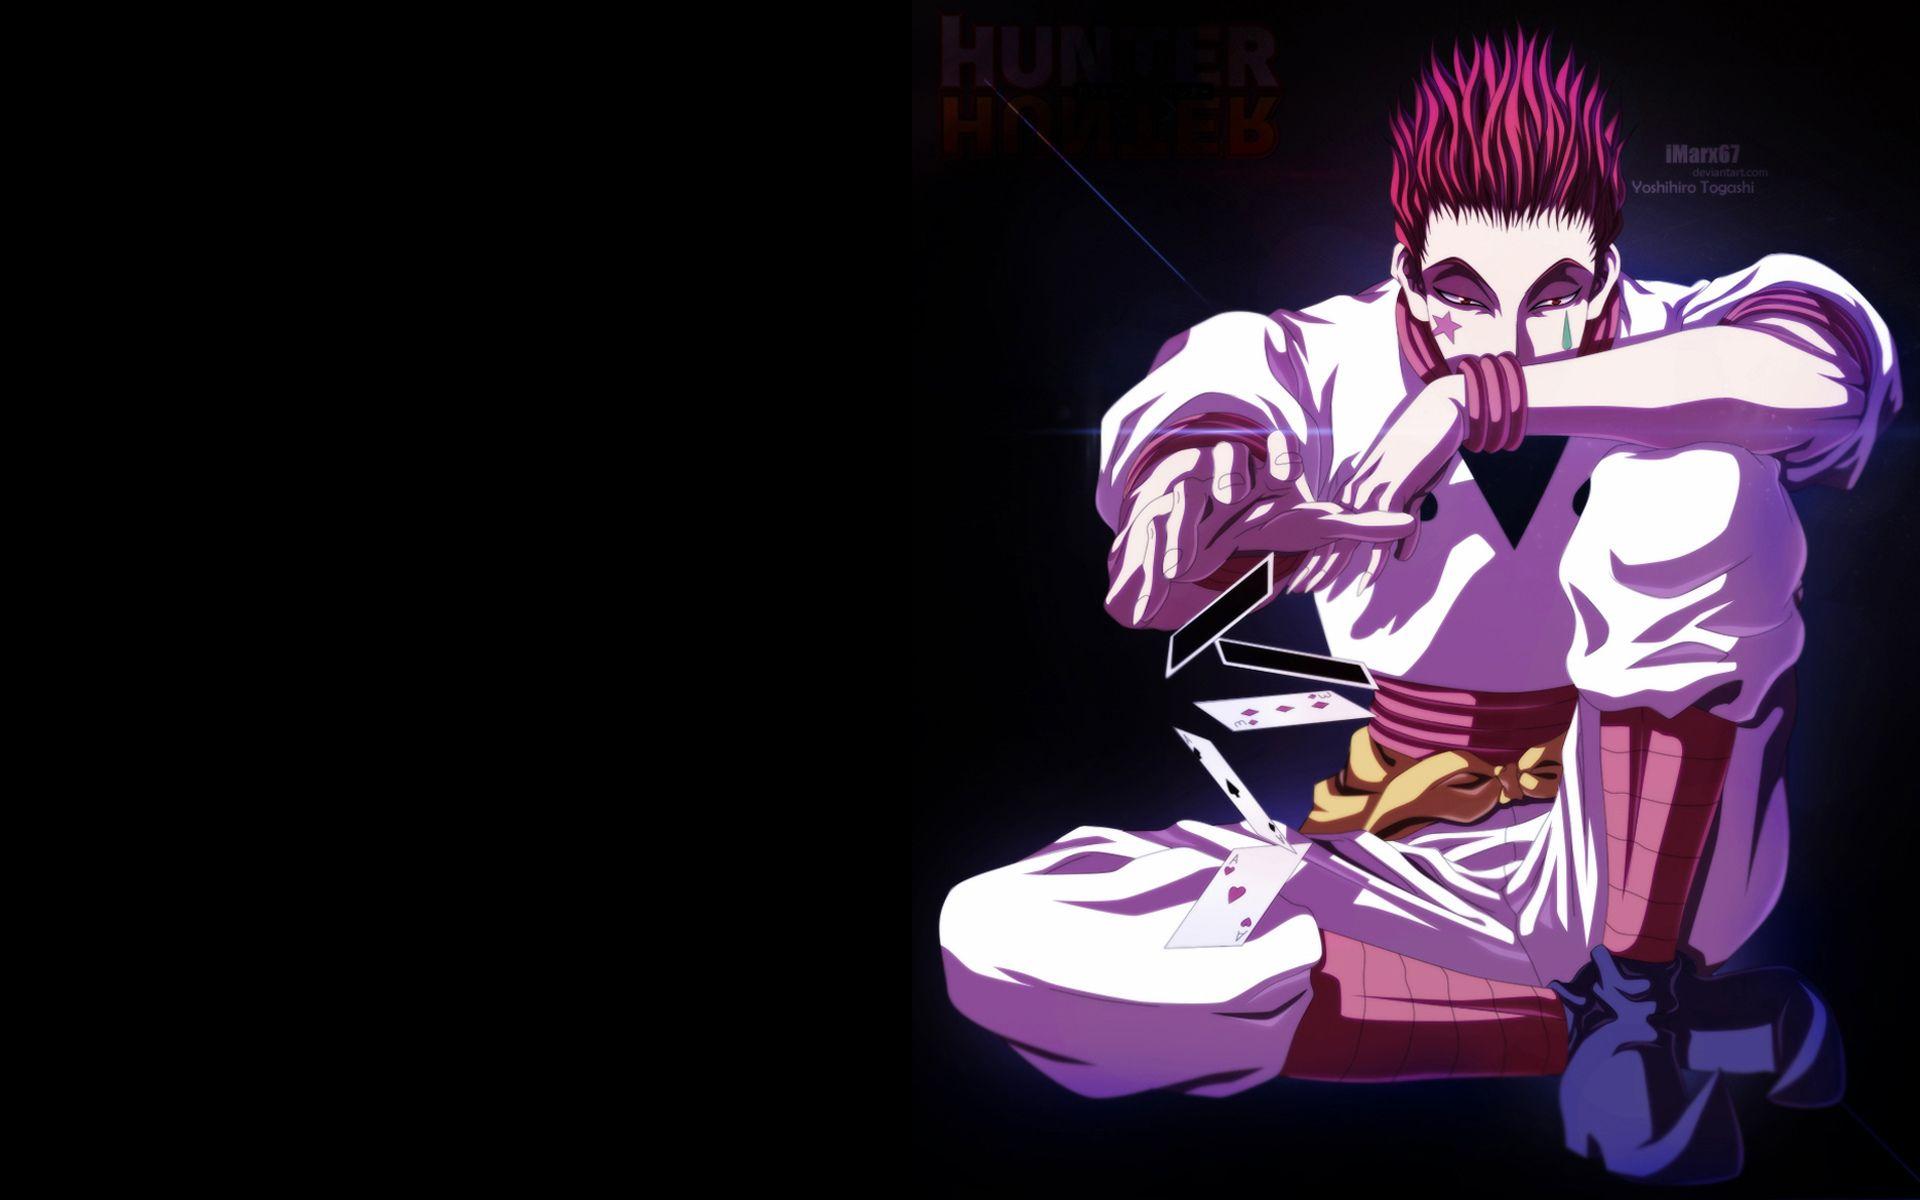 Hunter X Hunter Hisoka Wallpaper Widescreen Gos Hisoka Hunter Anime Hunter X Hunter